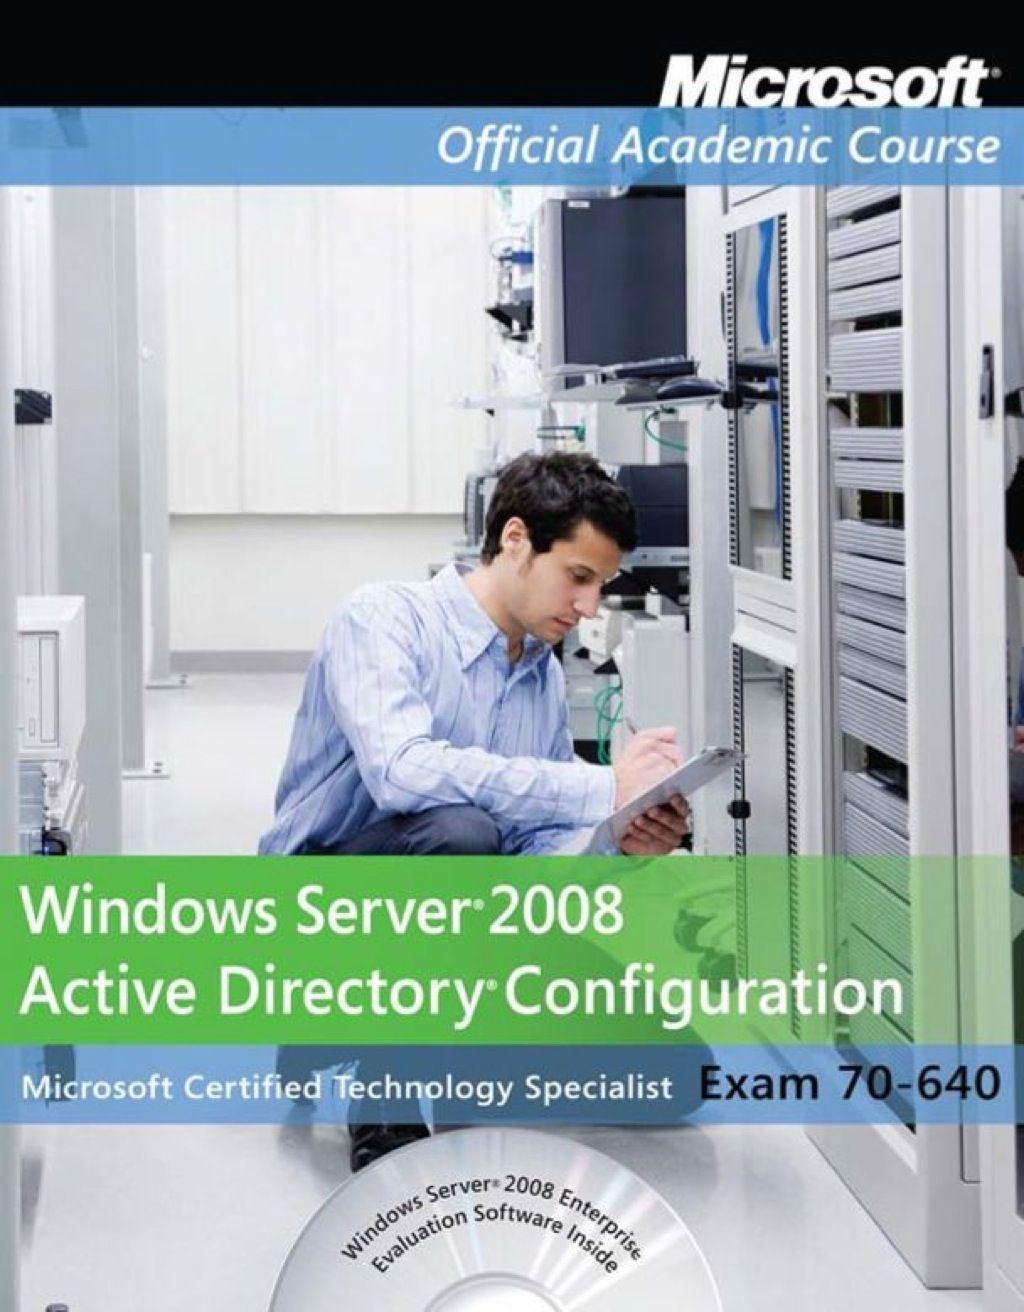 Windows Server 2008 Active Directory Configuration